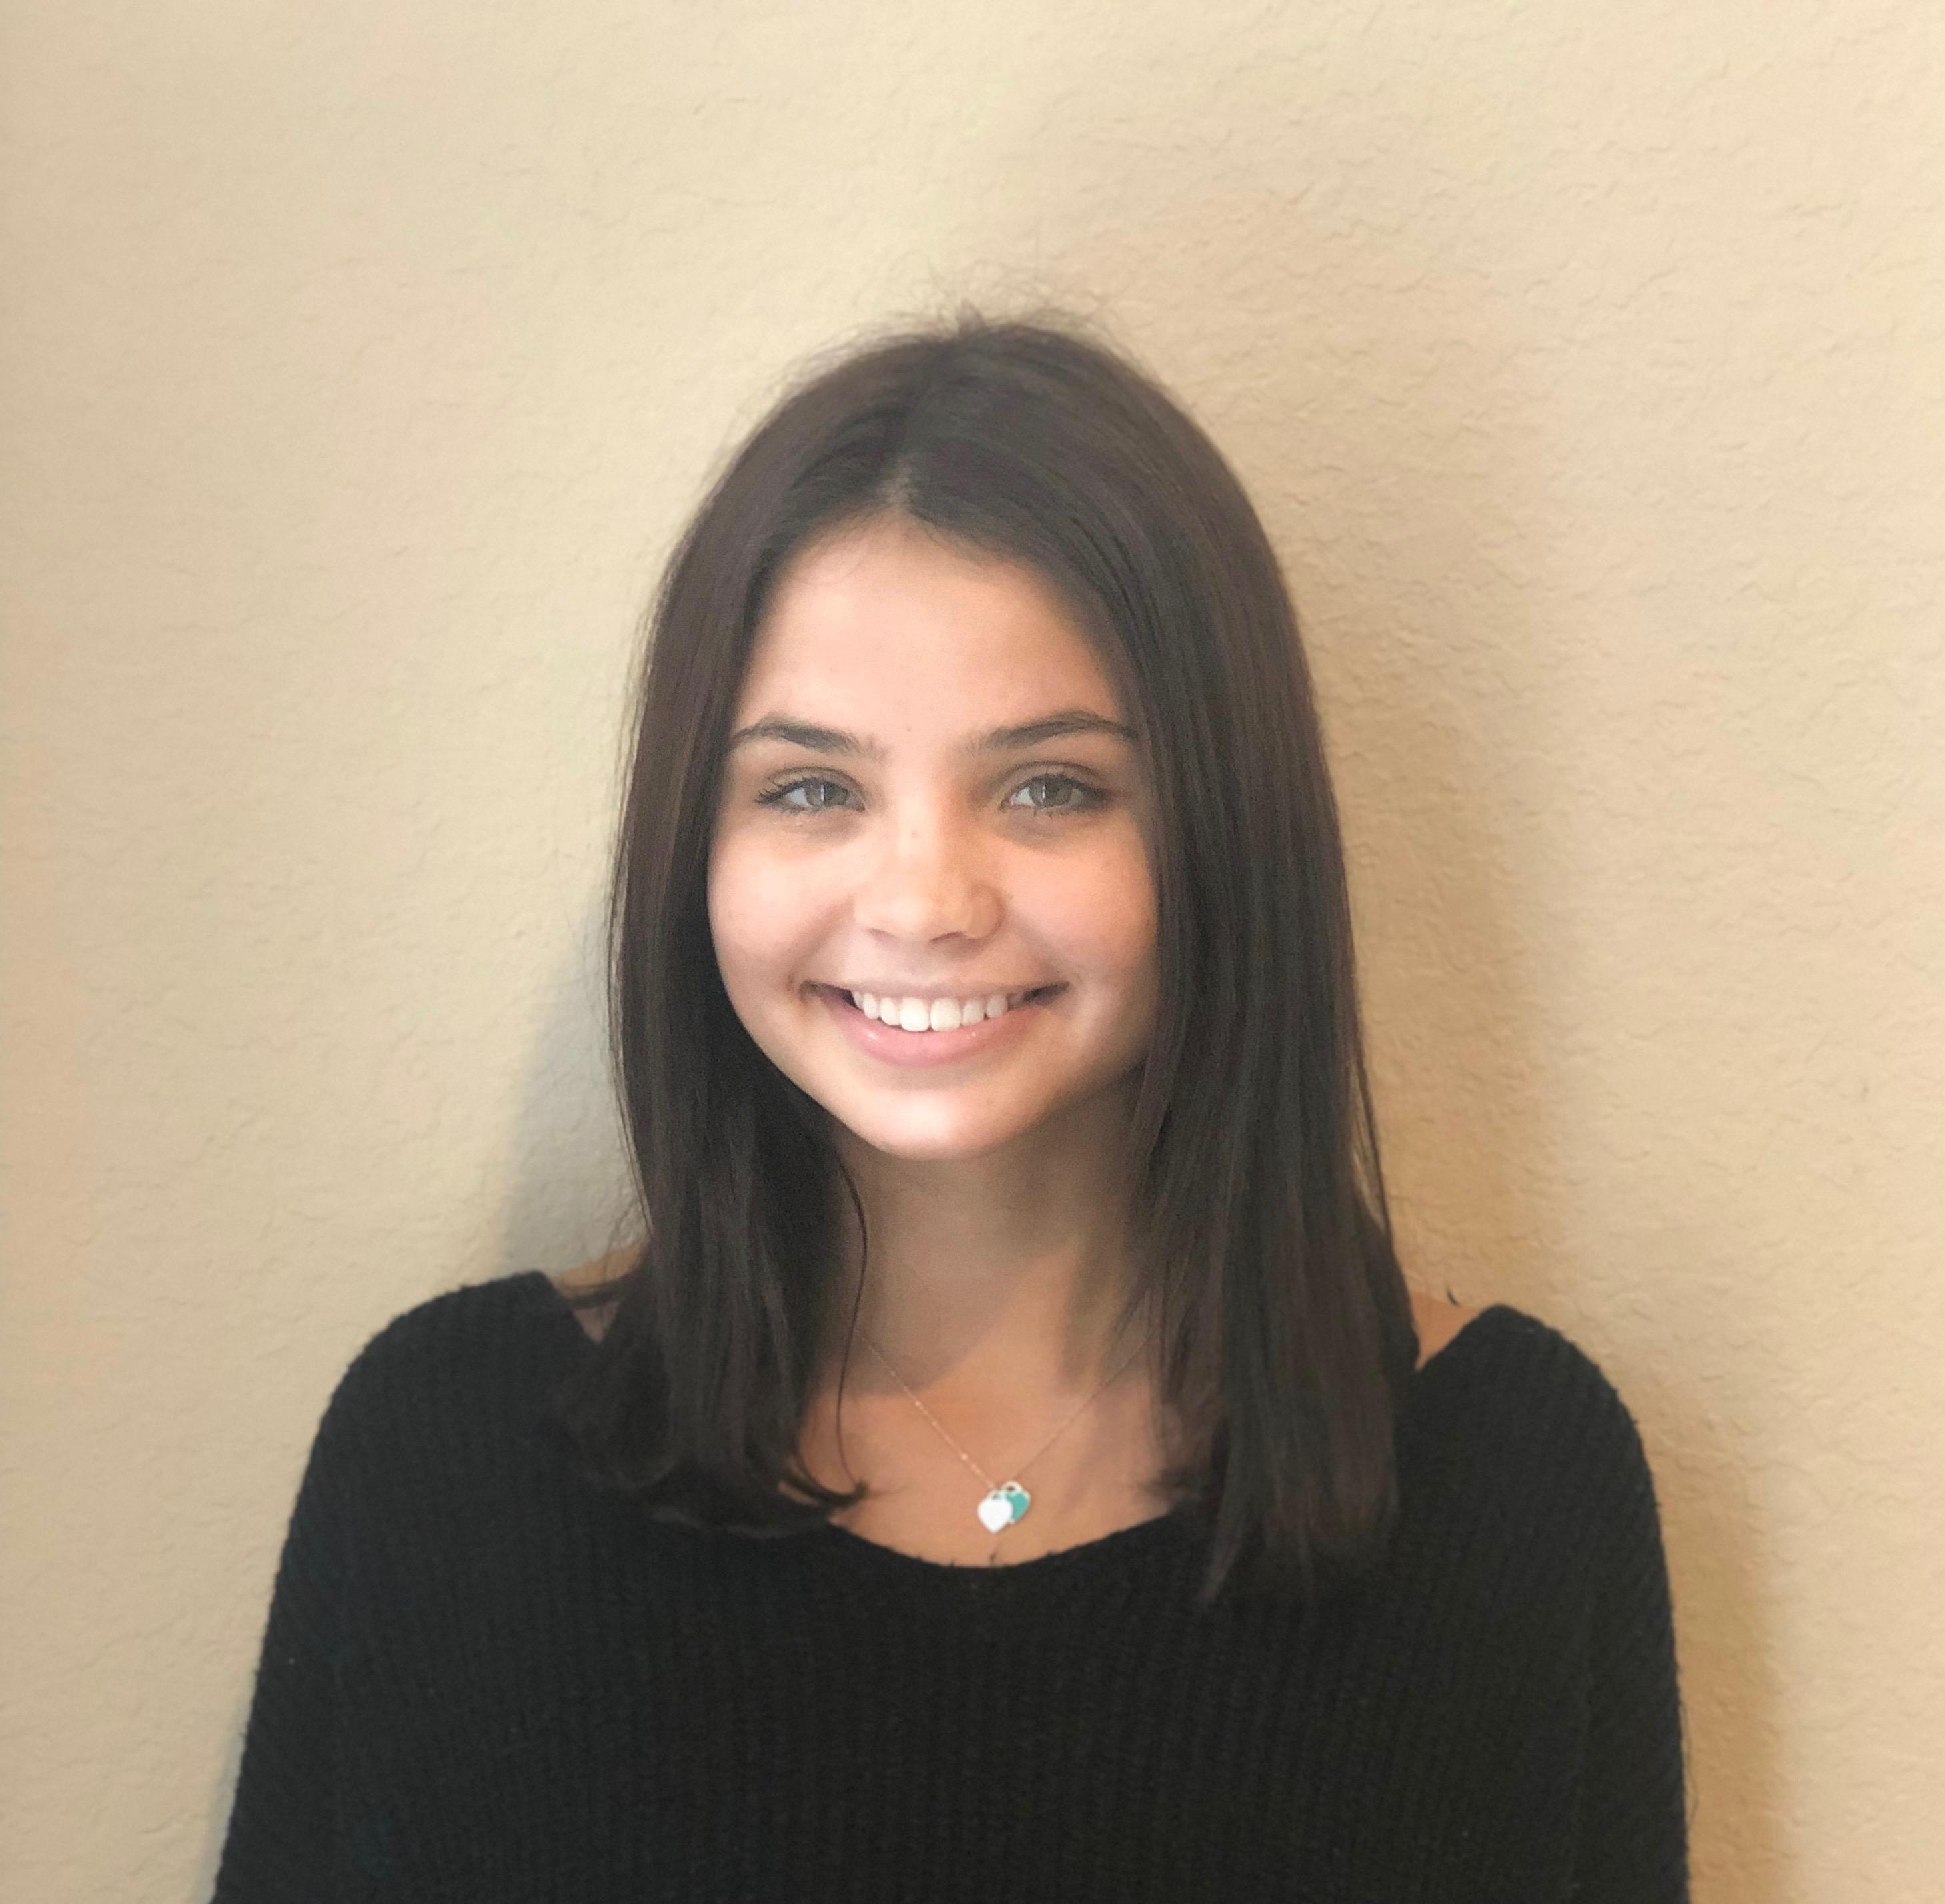 Haley Kohler